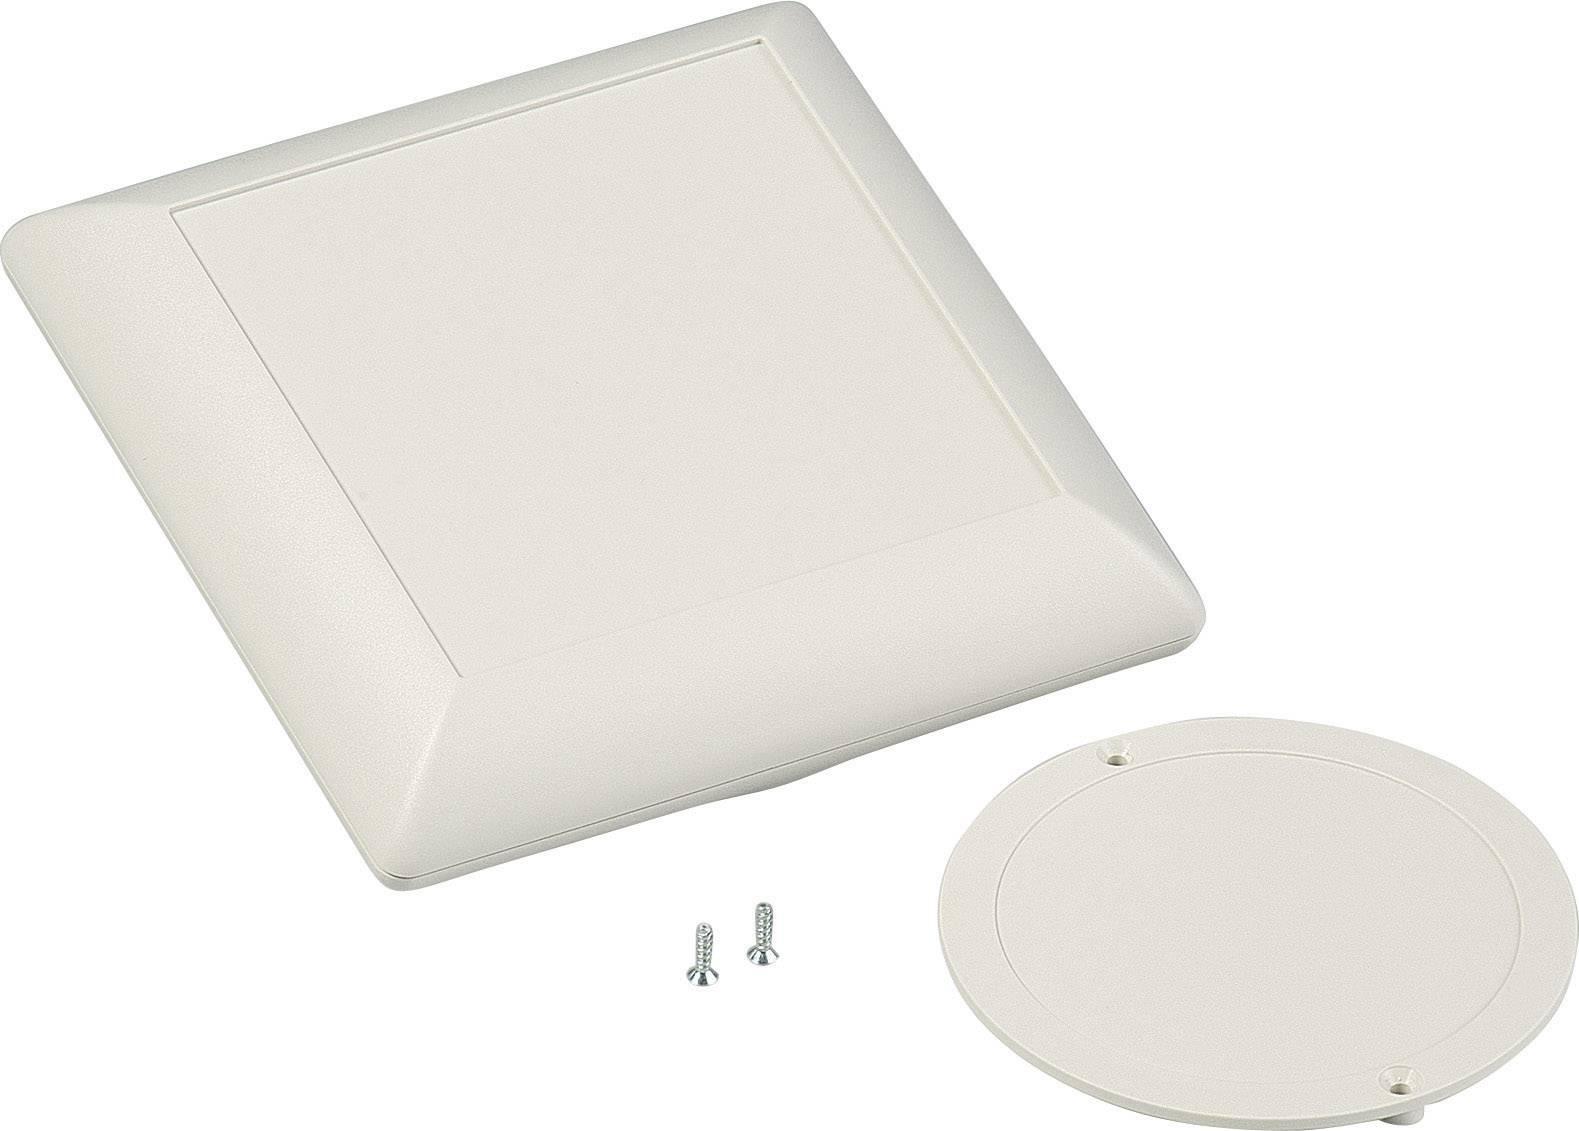 Skrinka na ovládací pult OKW Art-Case D5012247, 110 x 110 x 39 mm, ABS, sivobiela (RAL 9002), 1 sada